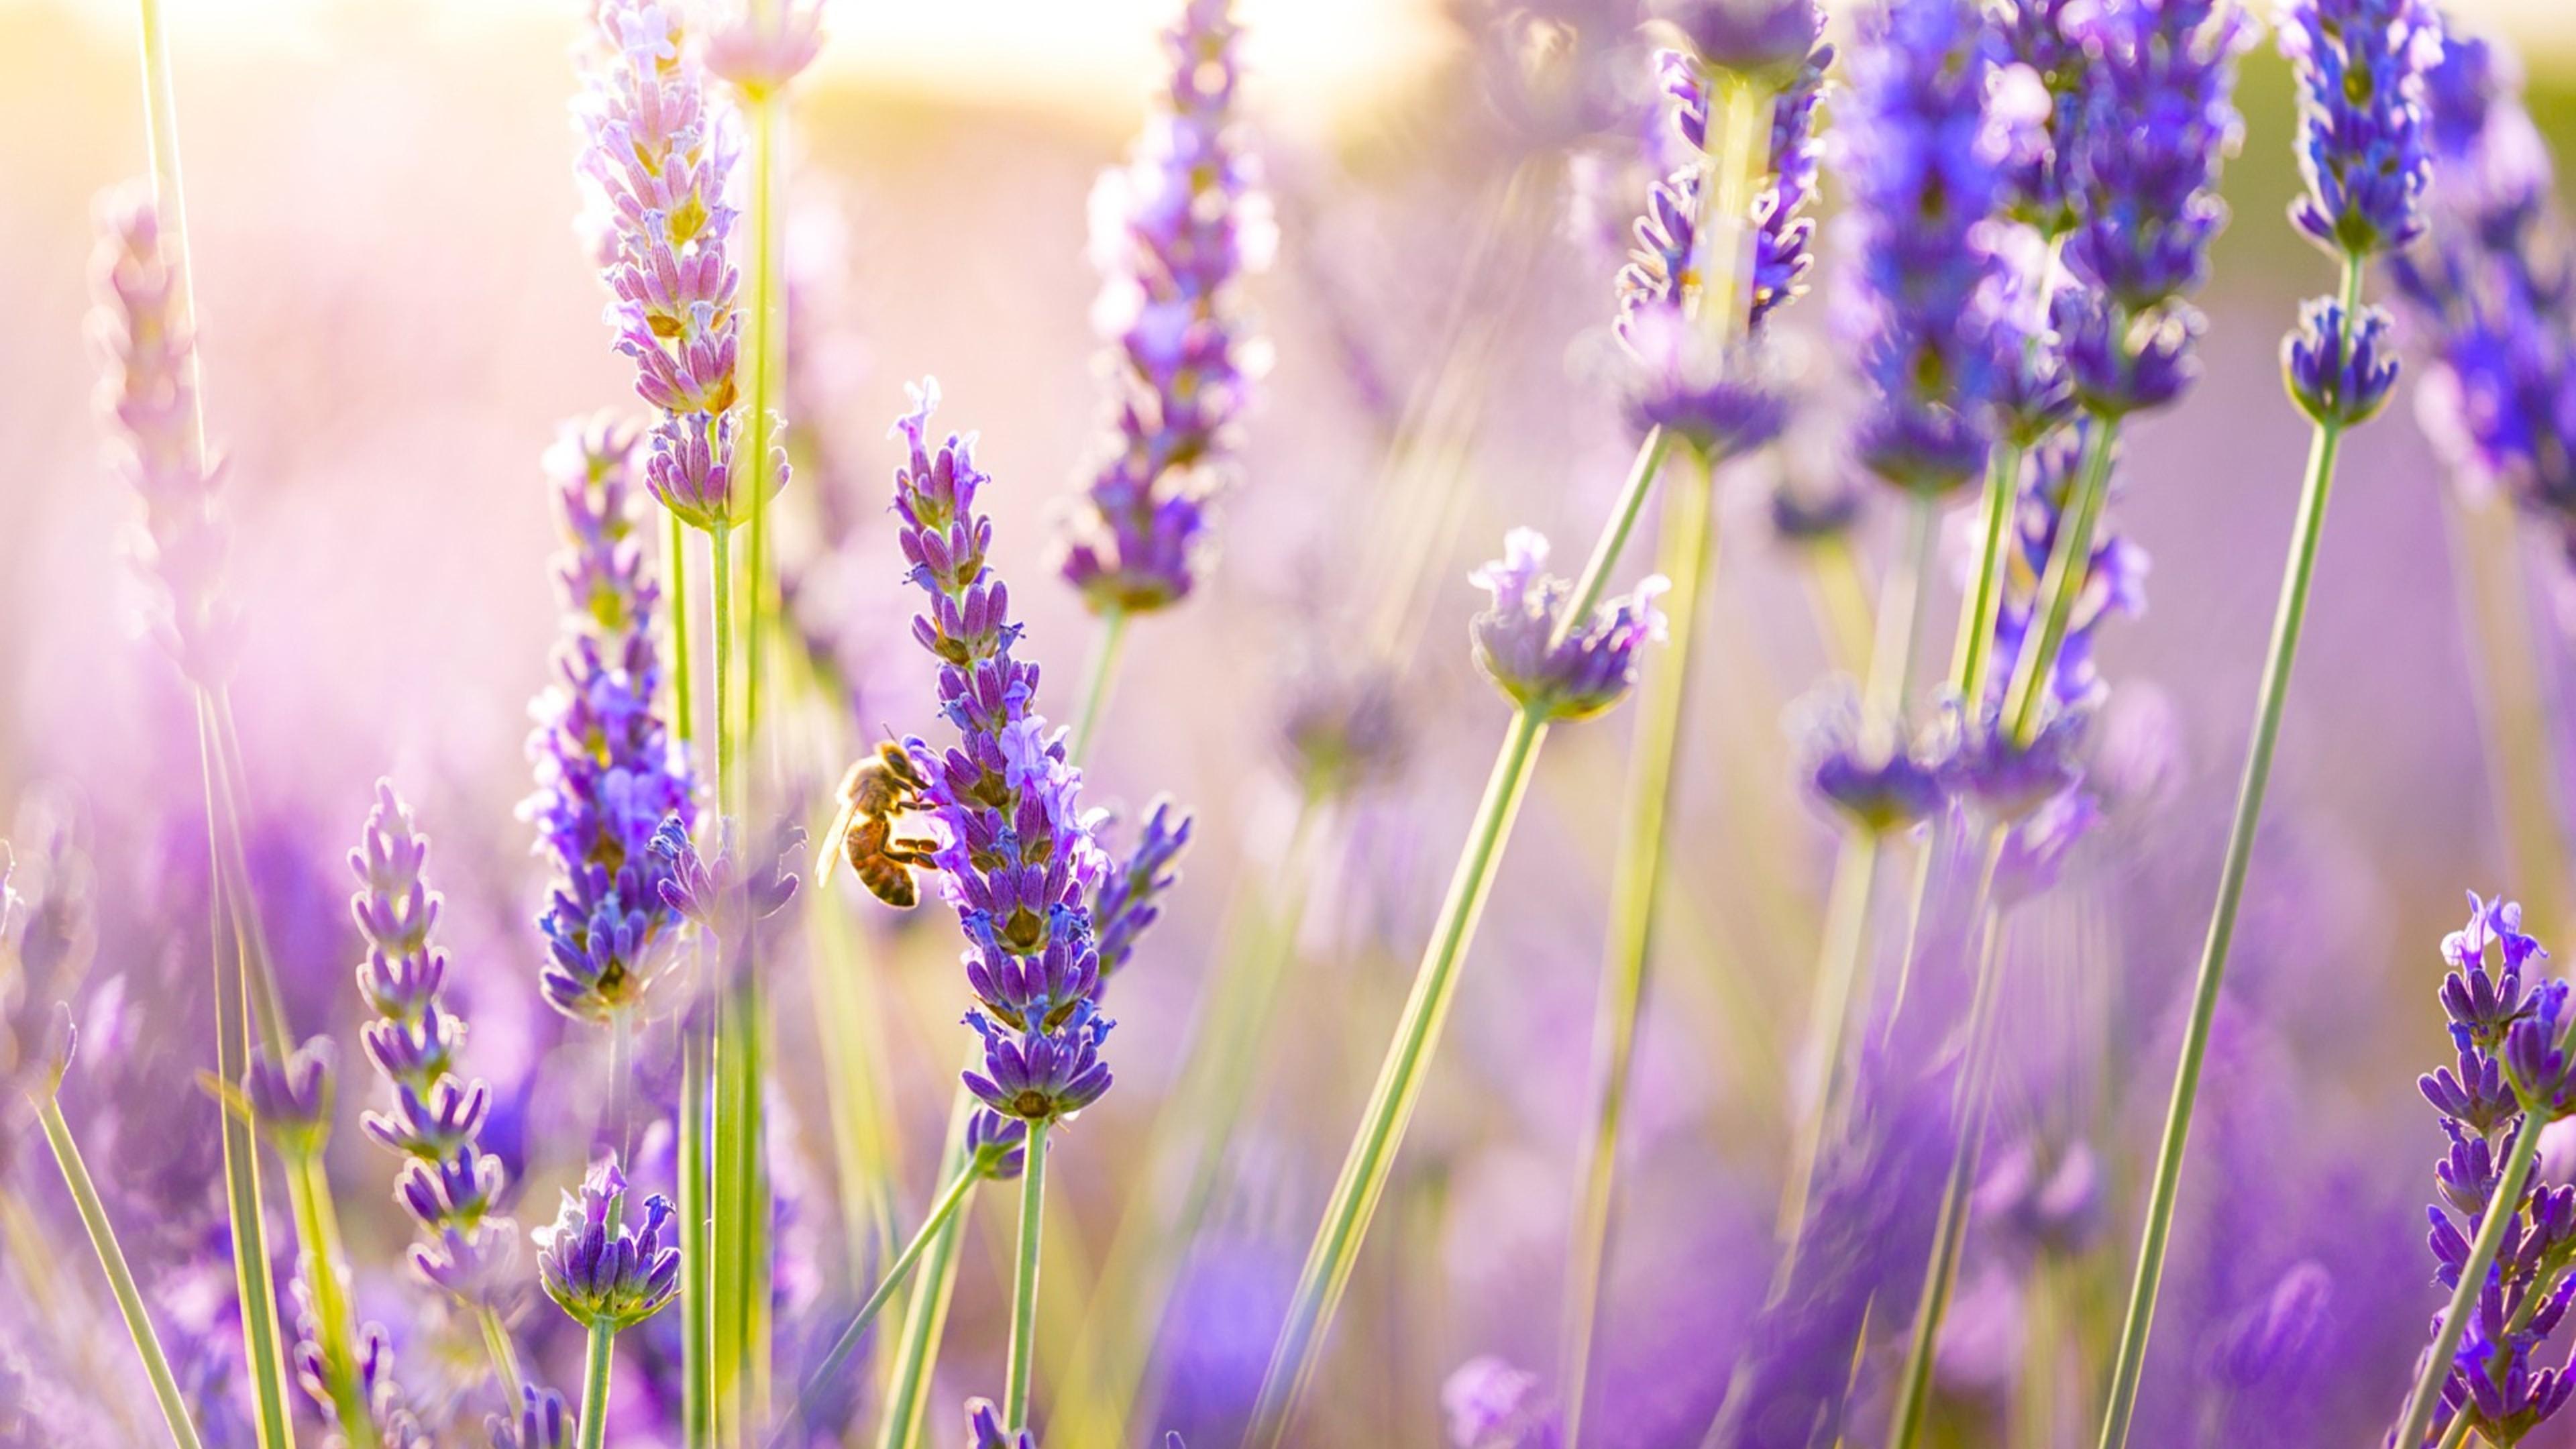 1336x768 Flowers Lavender Laptop Hd Hd 4k Wallpapers Images